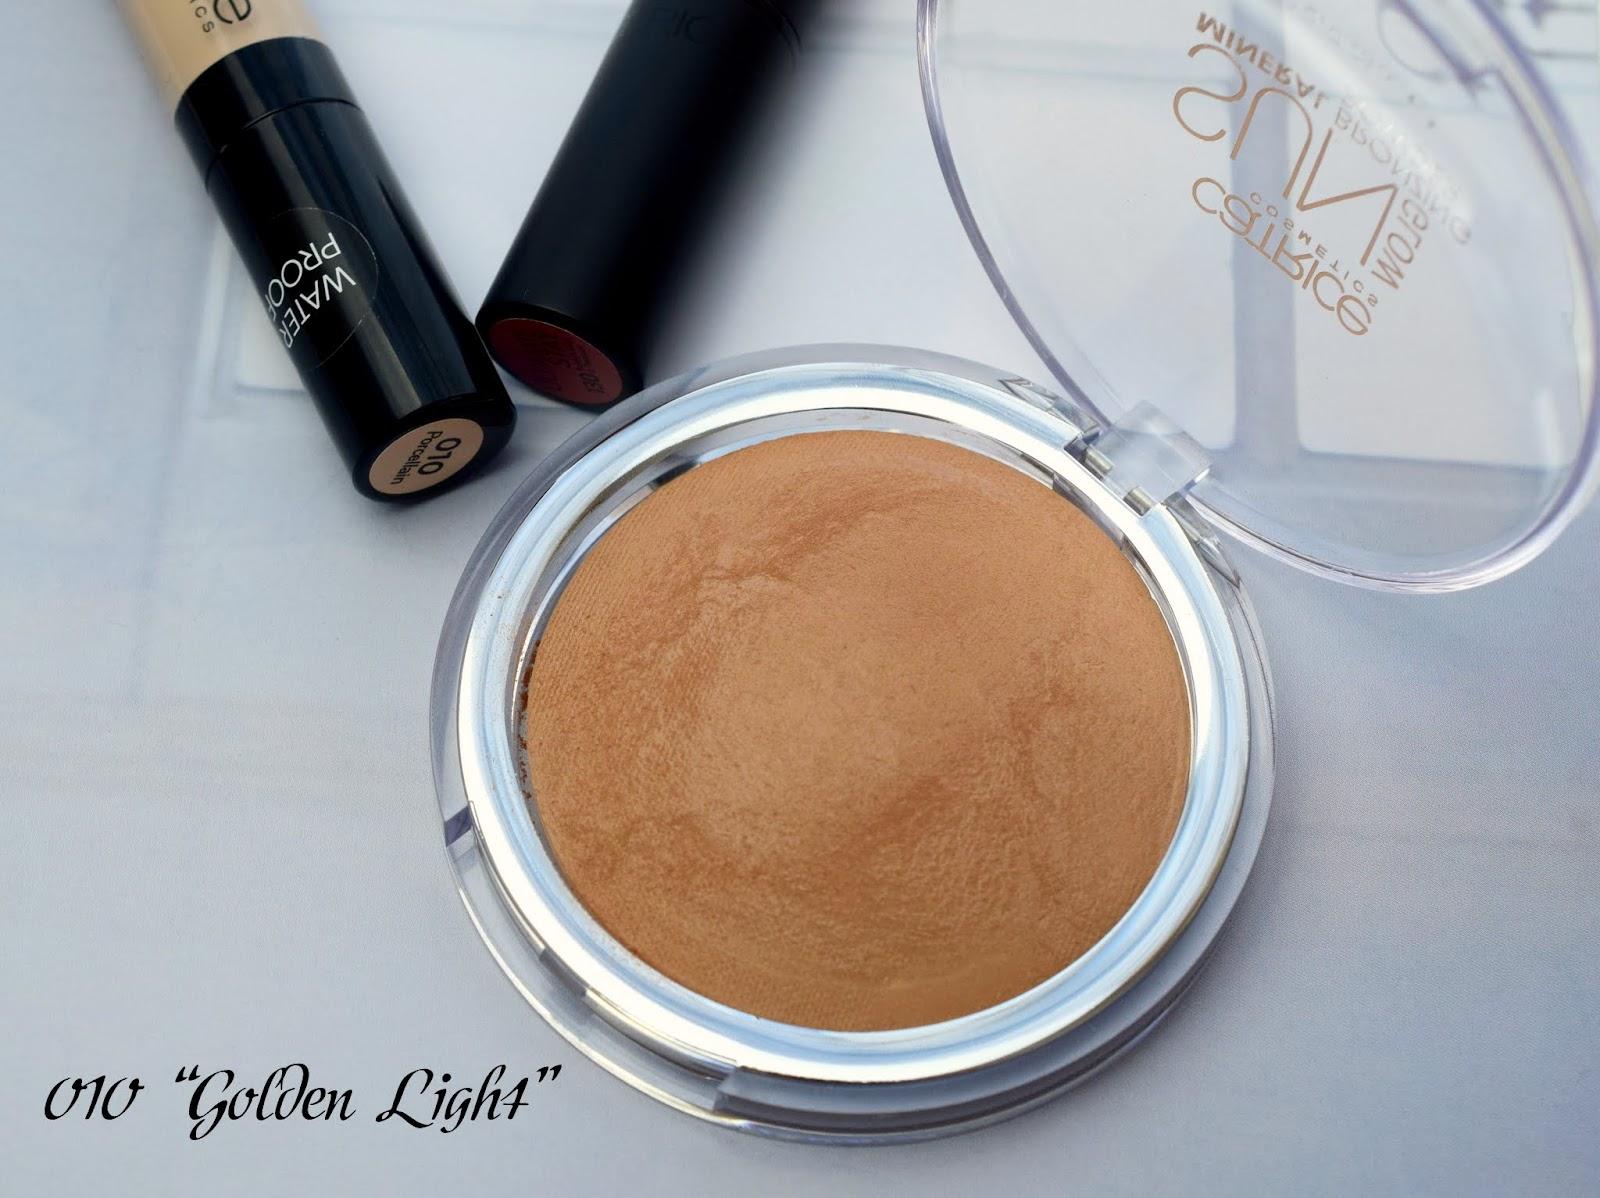 Catrice Sun Glow Mineral Bronzing Powder 010 Golden Light